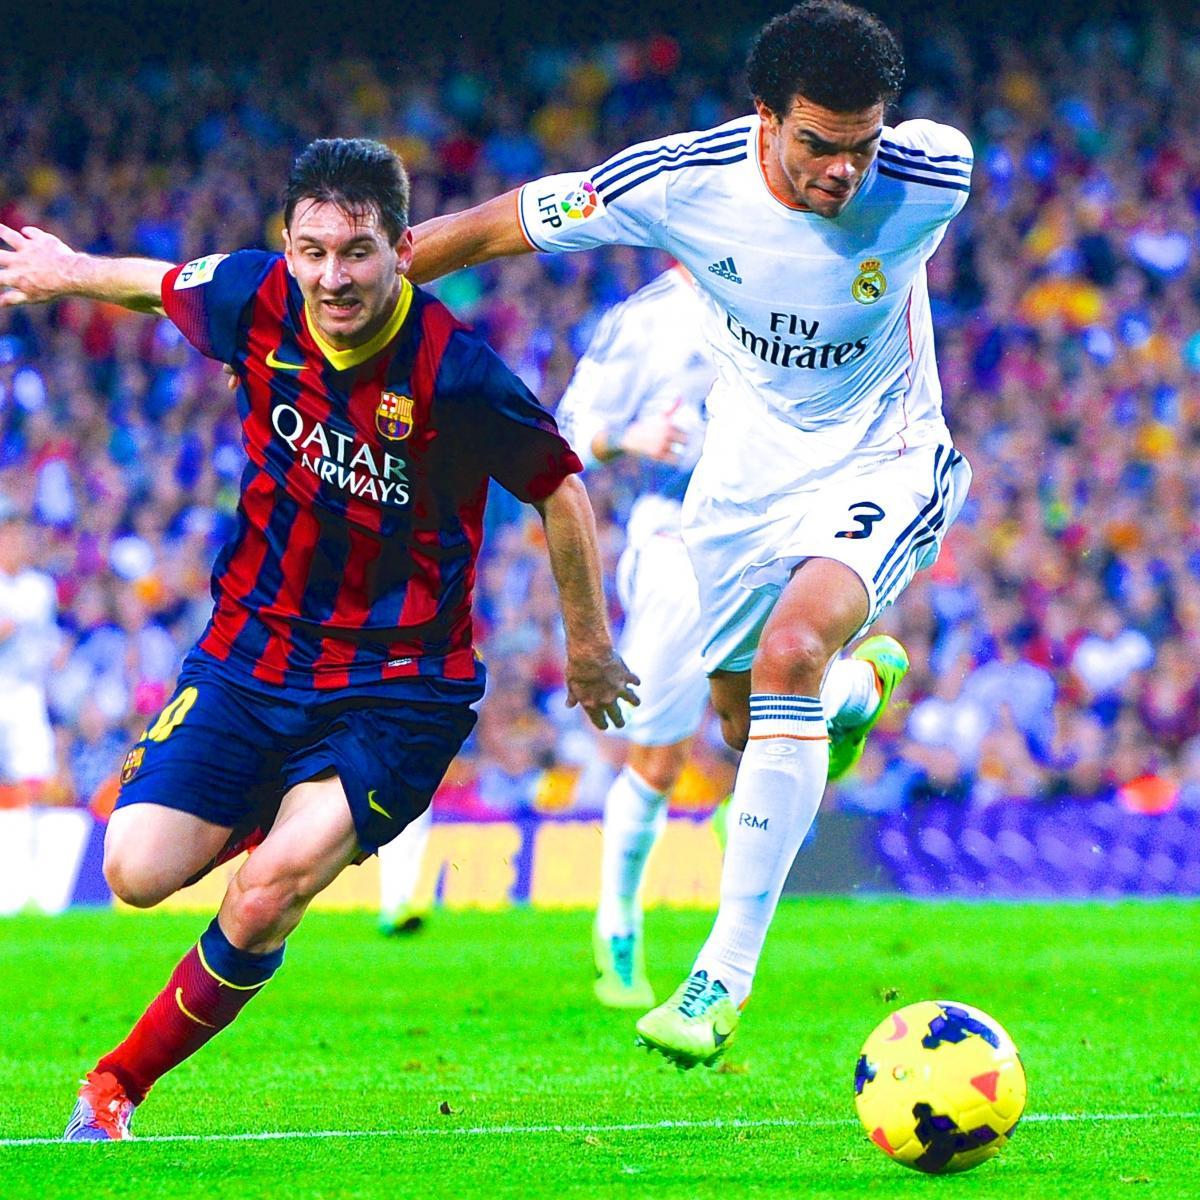 Psg Vs Manchester City Live Score Highlights From: Barcelona Vs. Real Madrid: Copa Del Rey Final Live Score